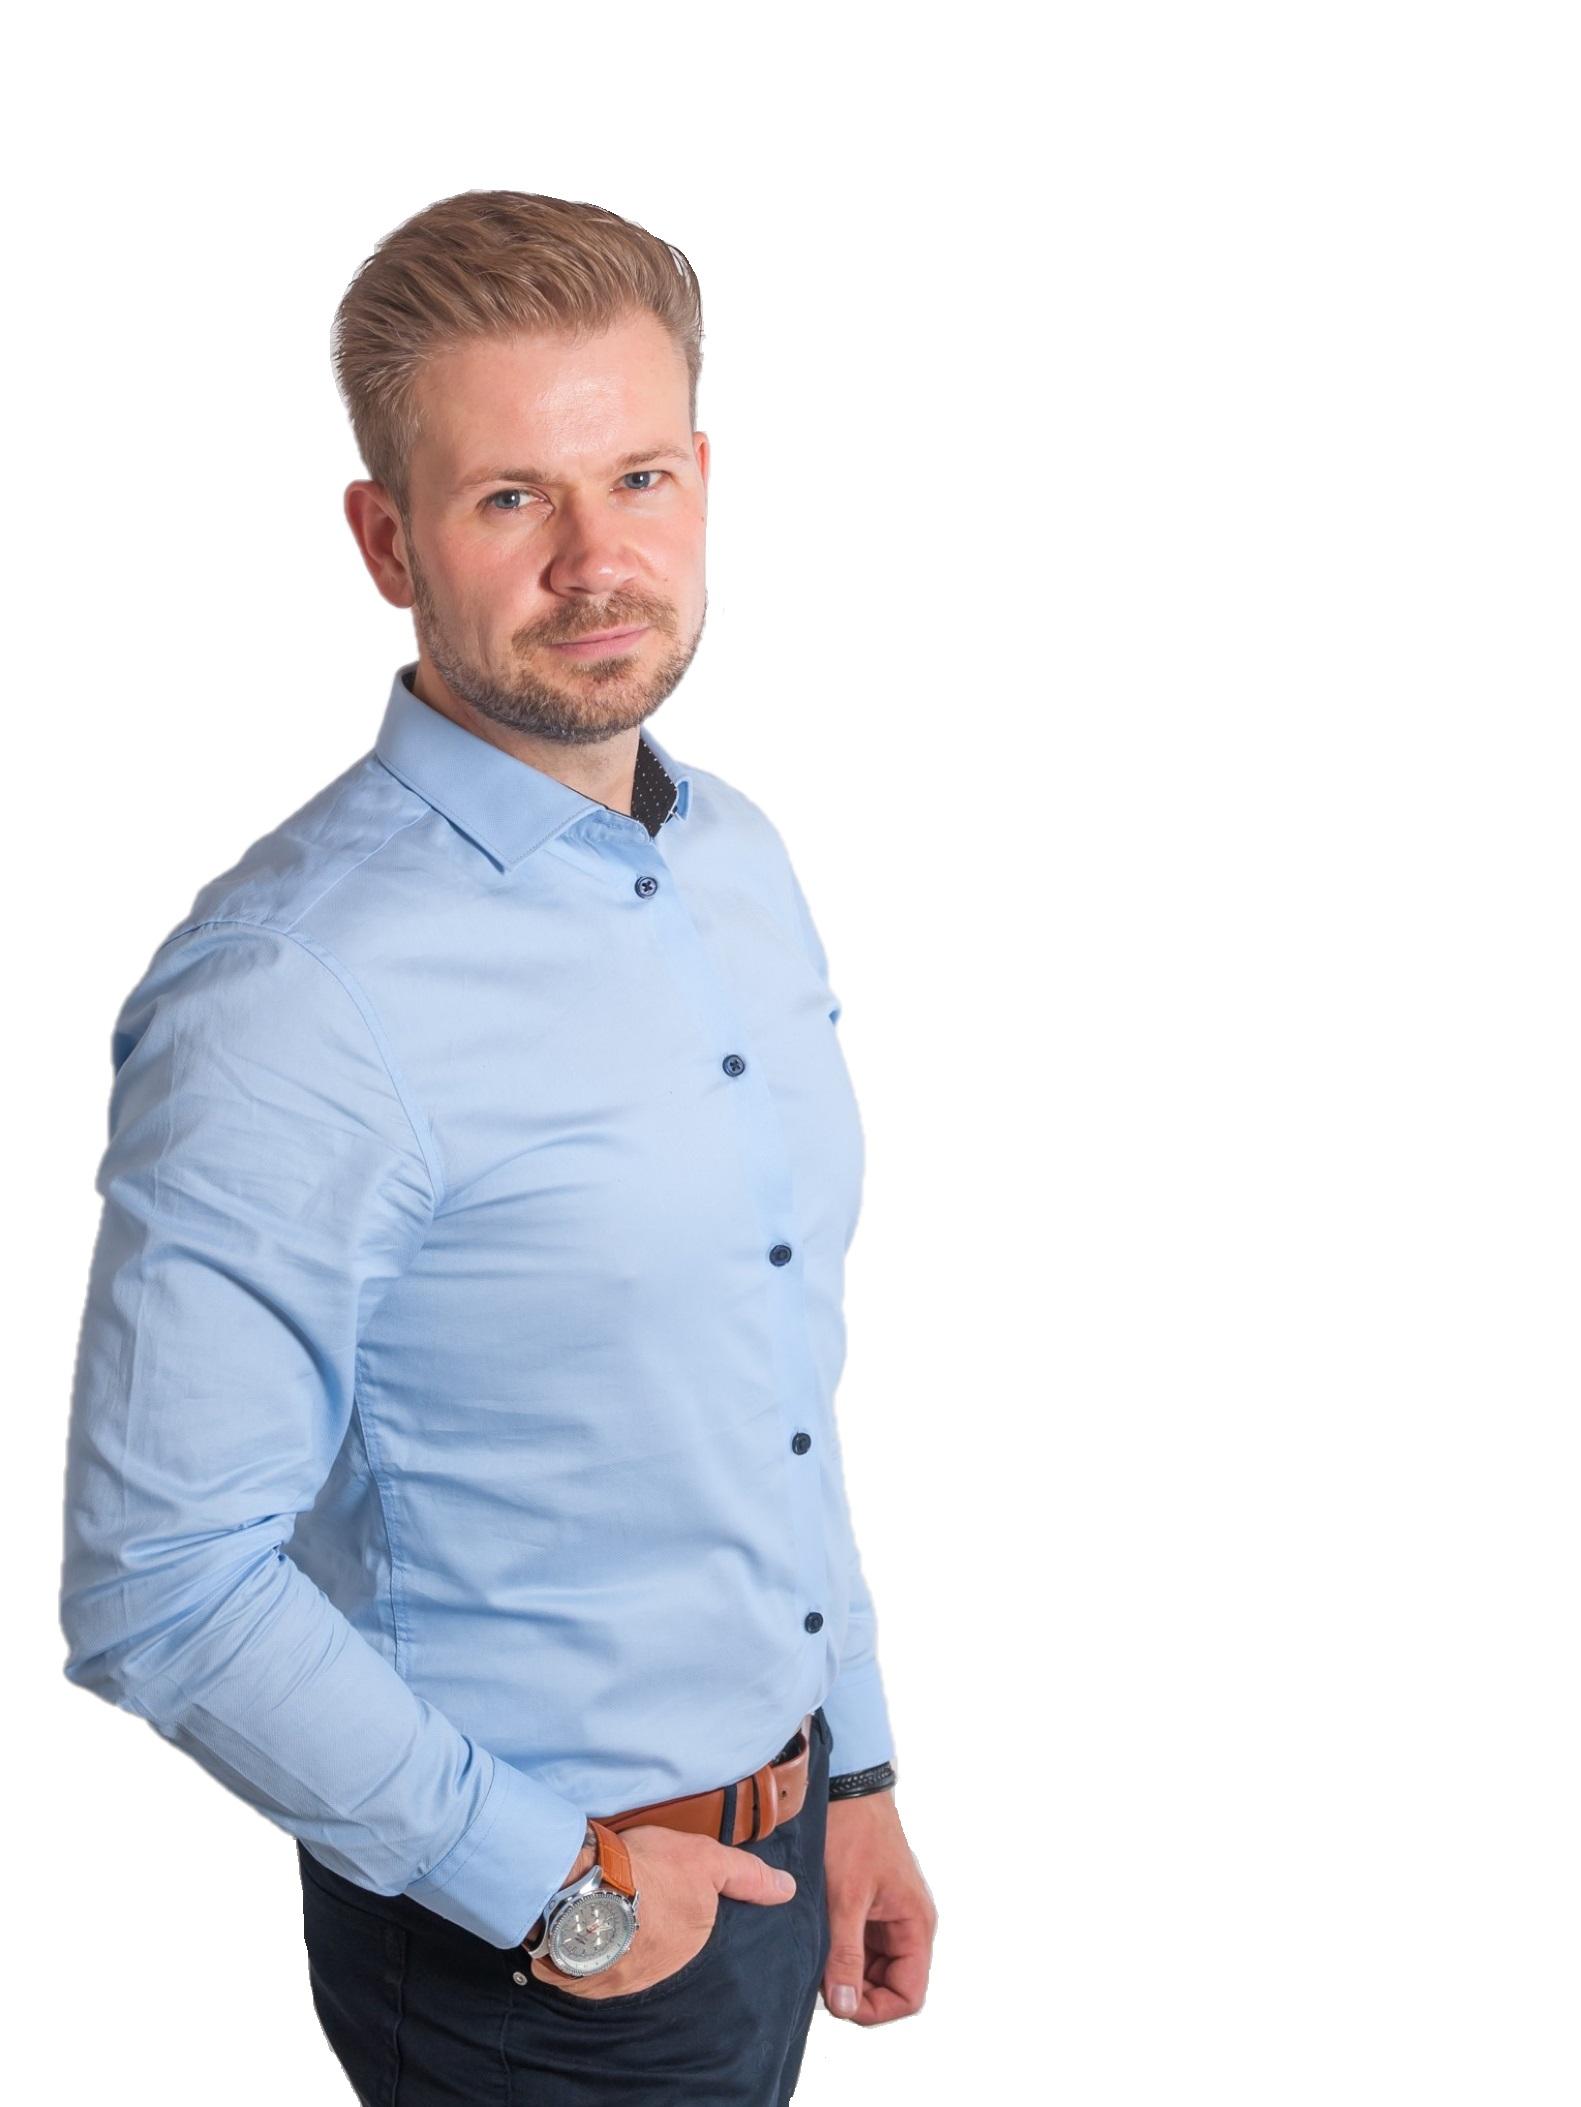 Daniel Peukert